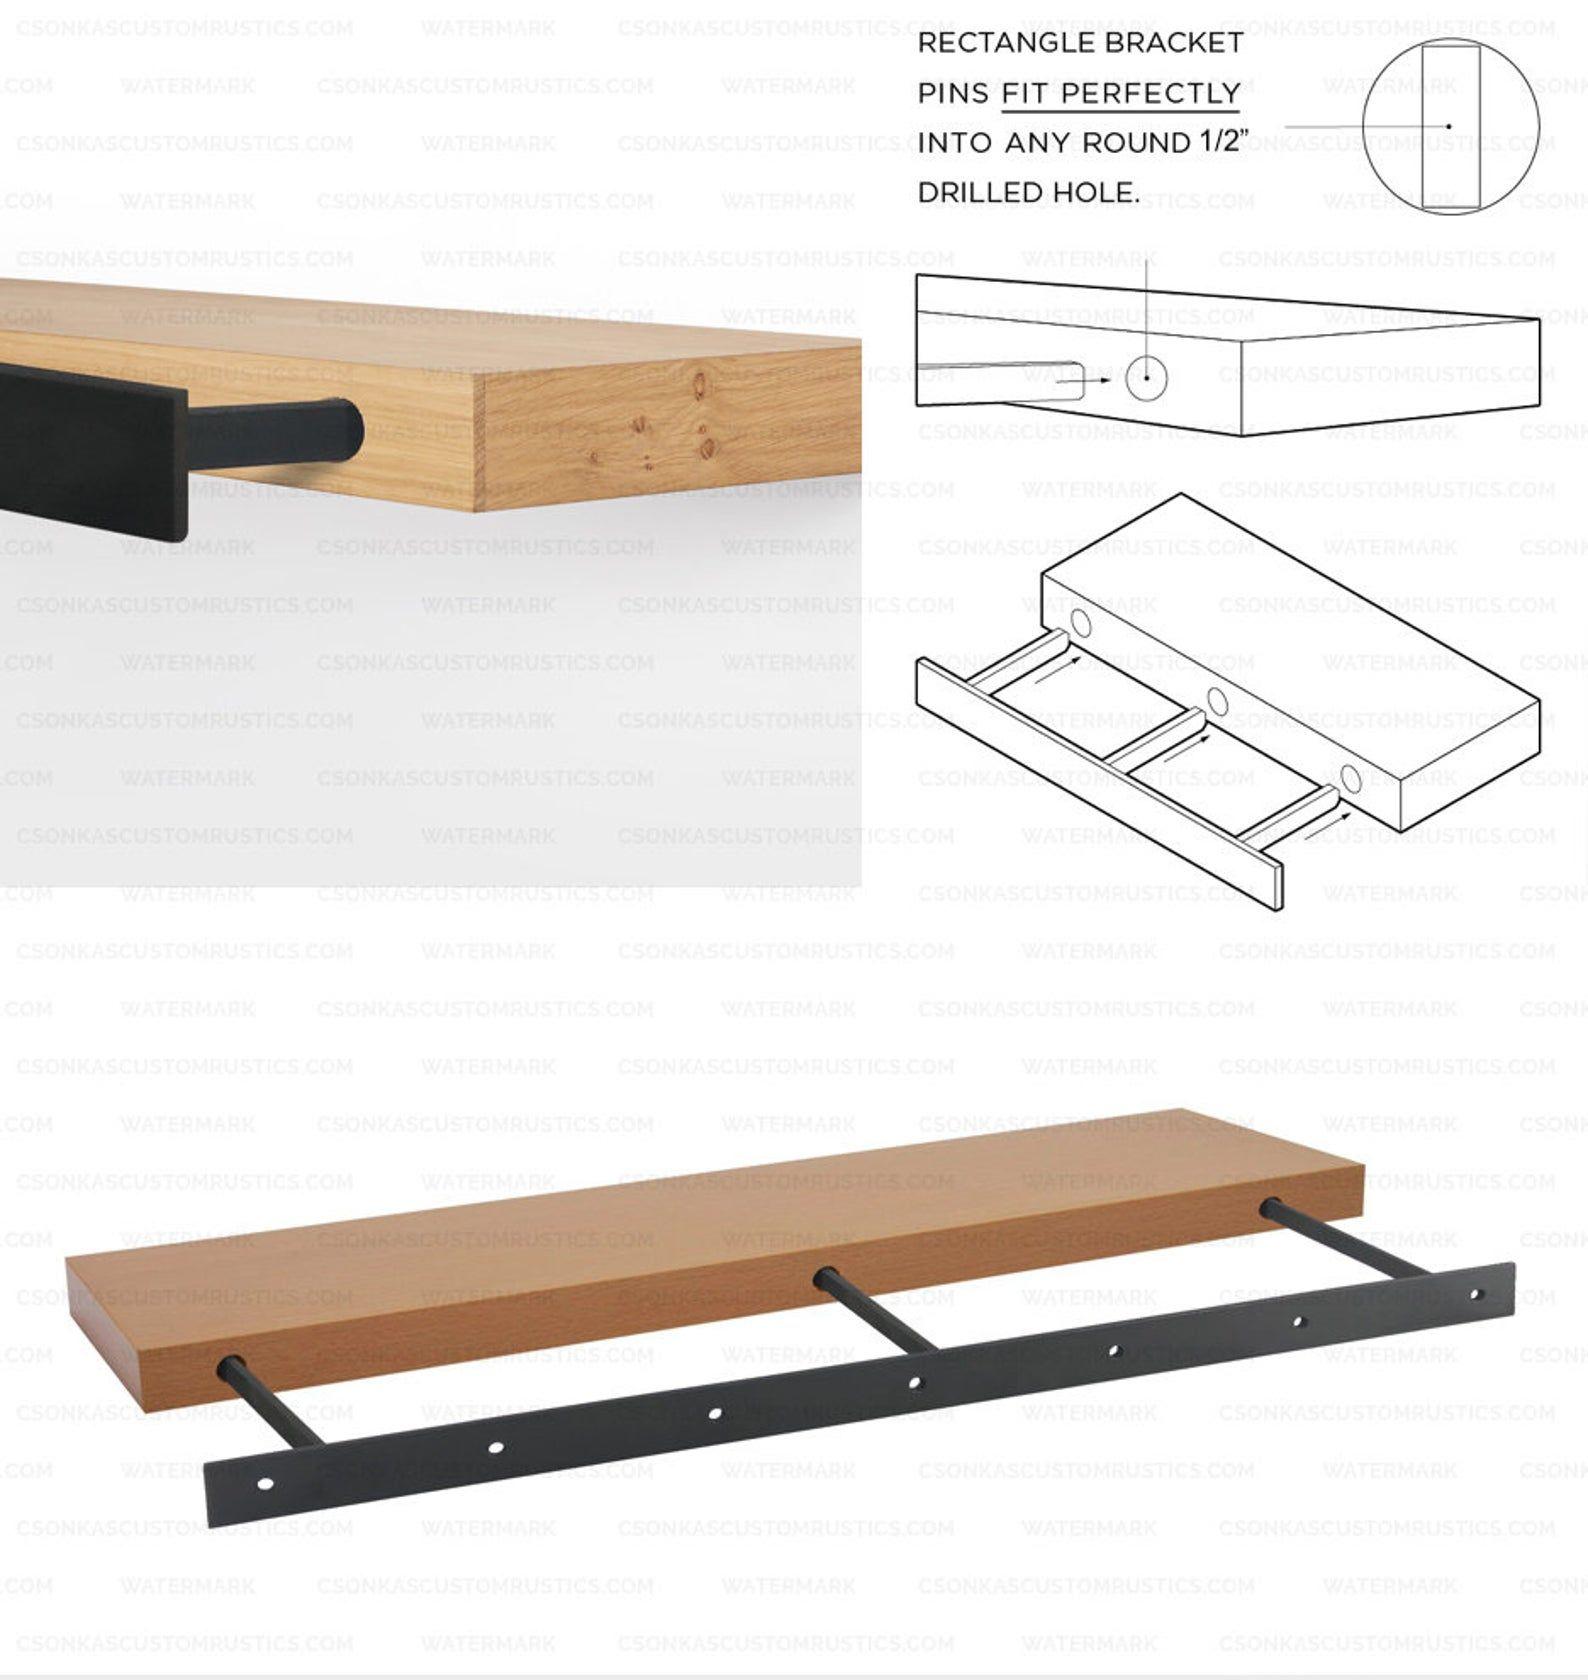 Floating Shelf Brackets Size Range 10l To 78l Etsy In 2020 Floating Shelf Brackets Shelf Brackets Floating Shelves